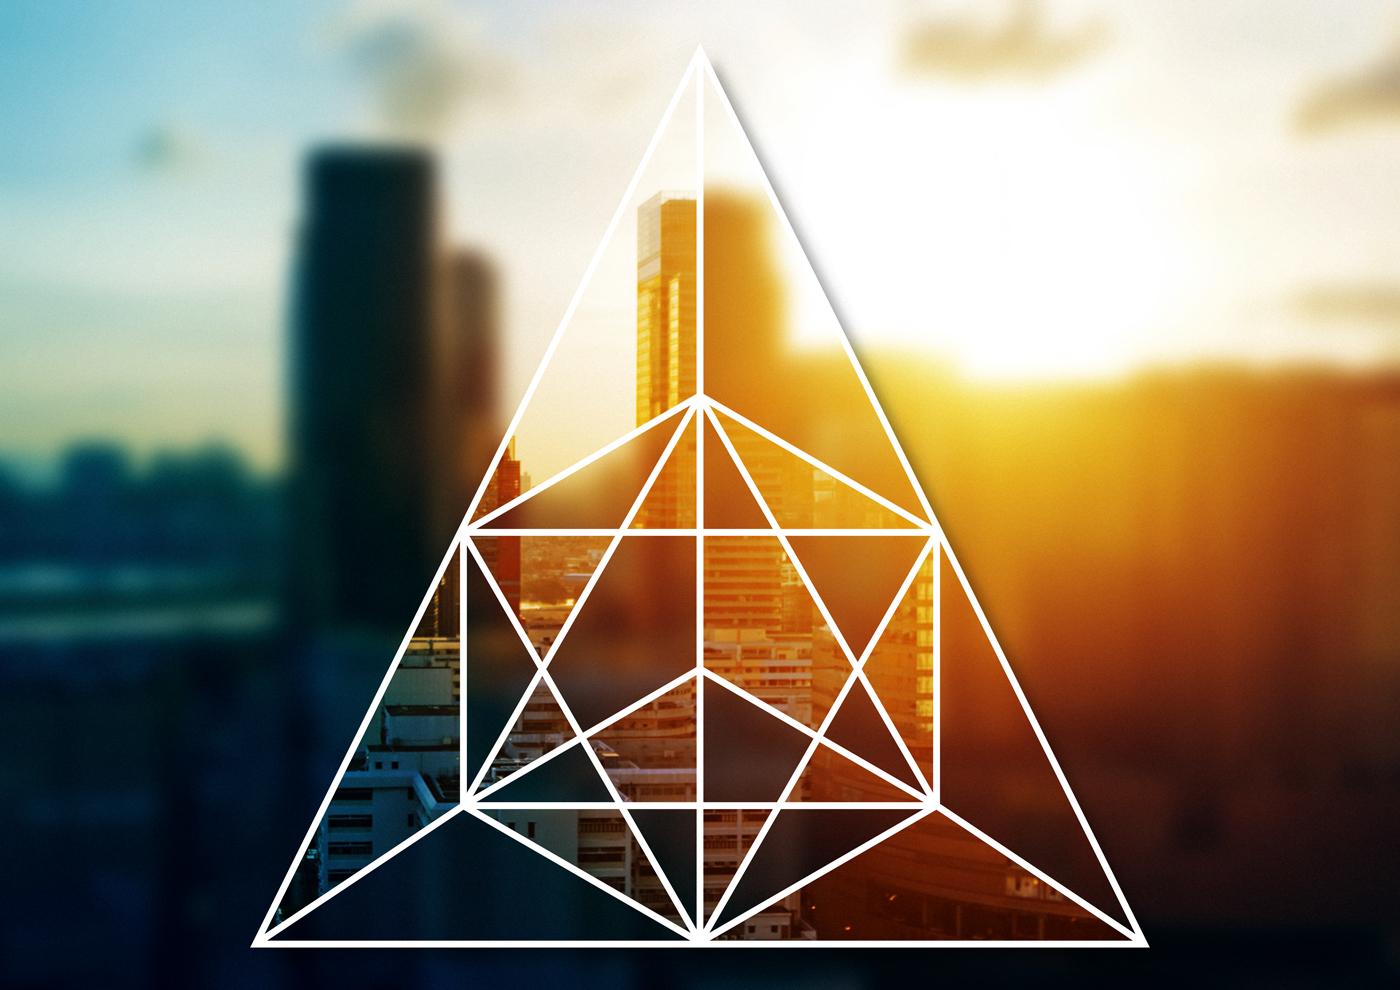 interlocking geometric shapes masks adobe stock template Photoshop cc New Document